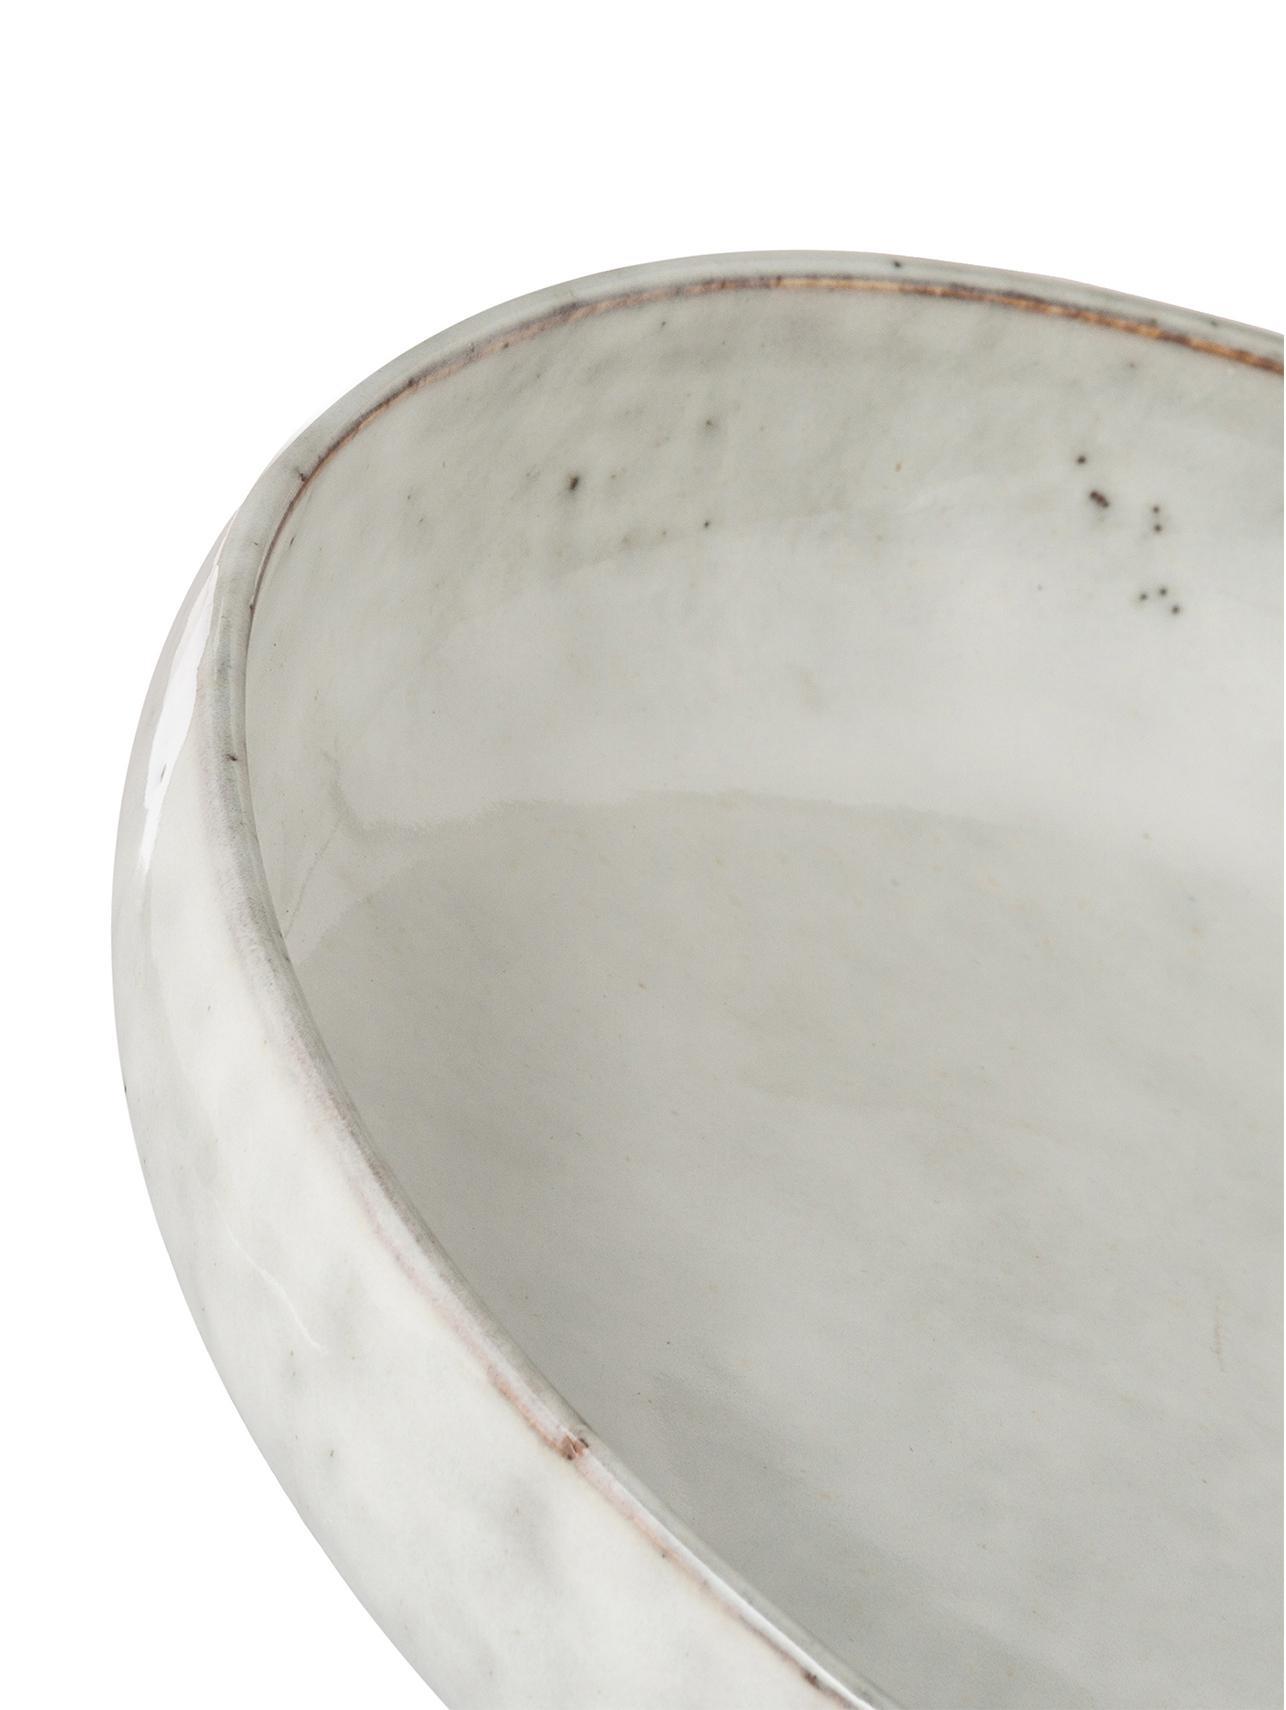 Ciotola in teracotta fatta a mano Nordic Sand 4 pz, Terracotta, Sabbia, Ø 22 x Alt. 5 cm